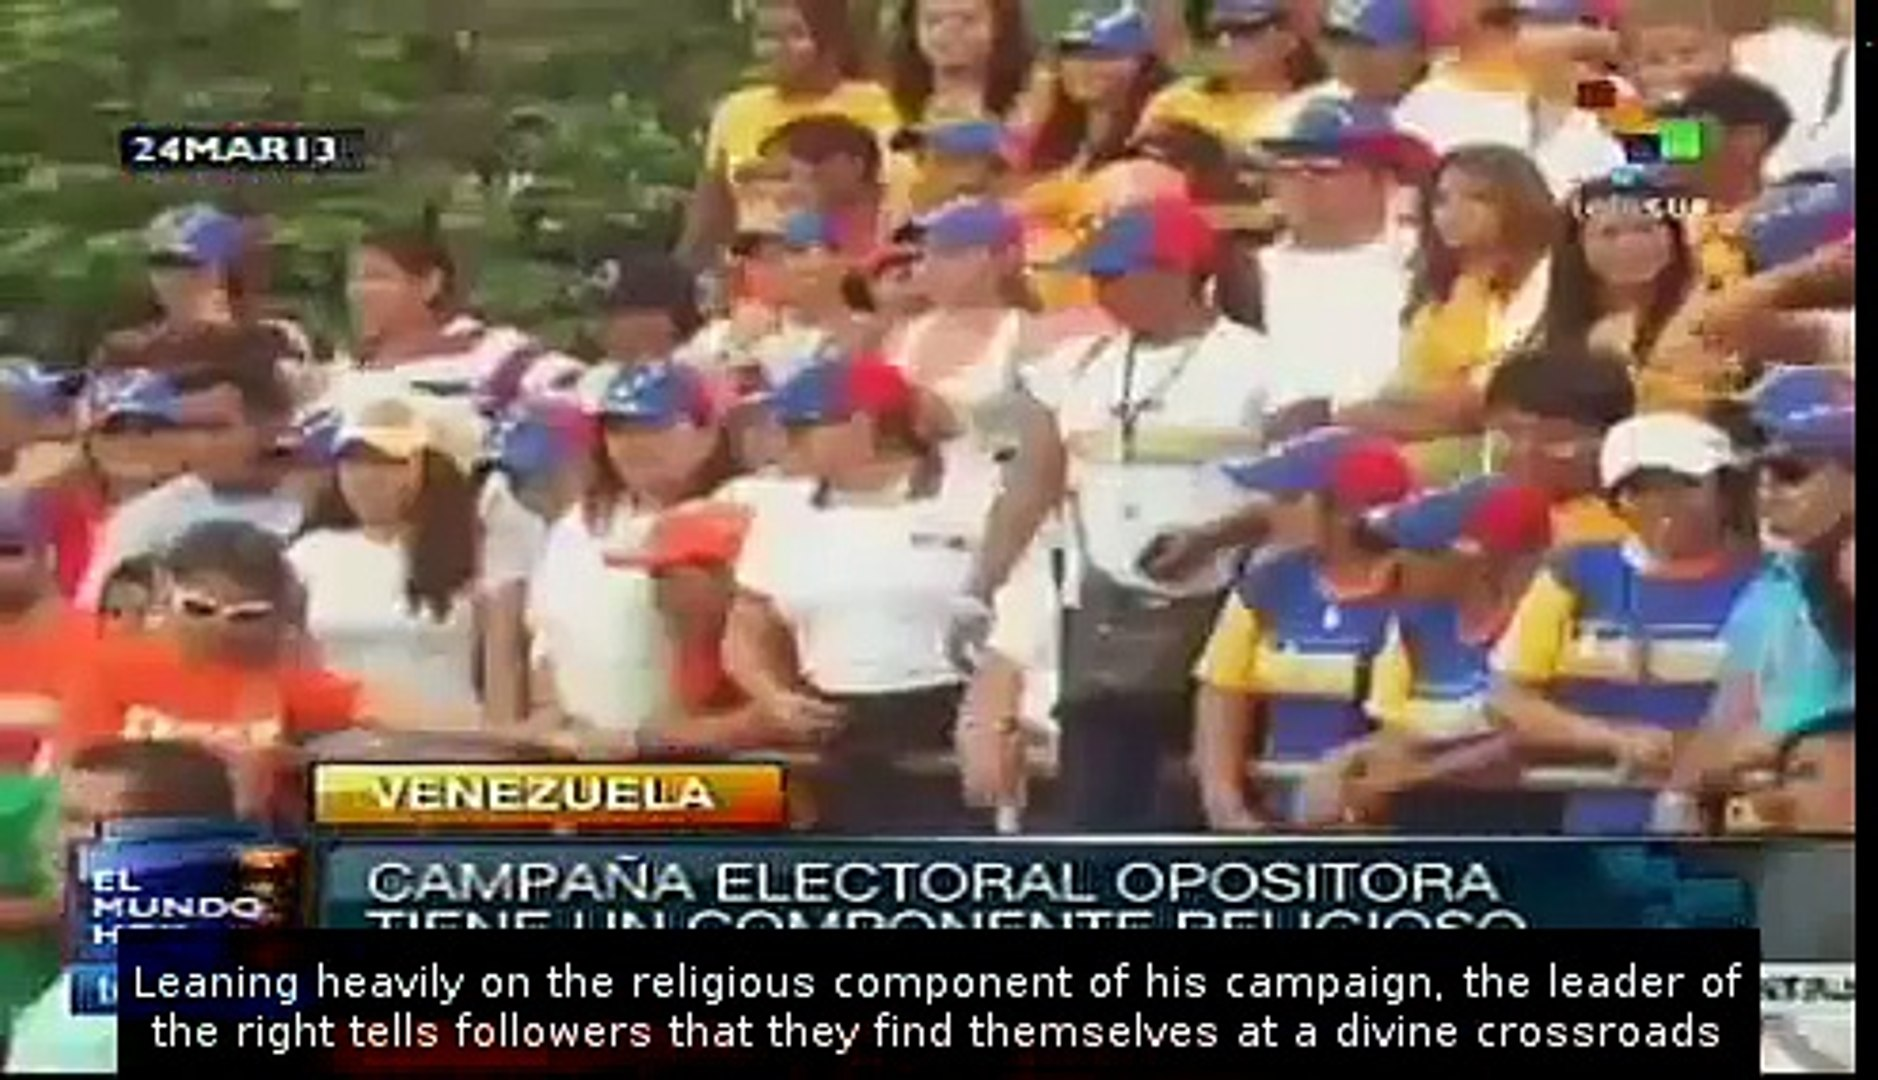 Capriles' electoral campaign has religious component